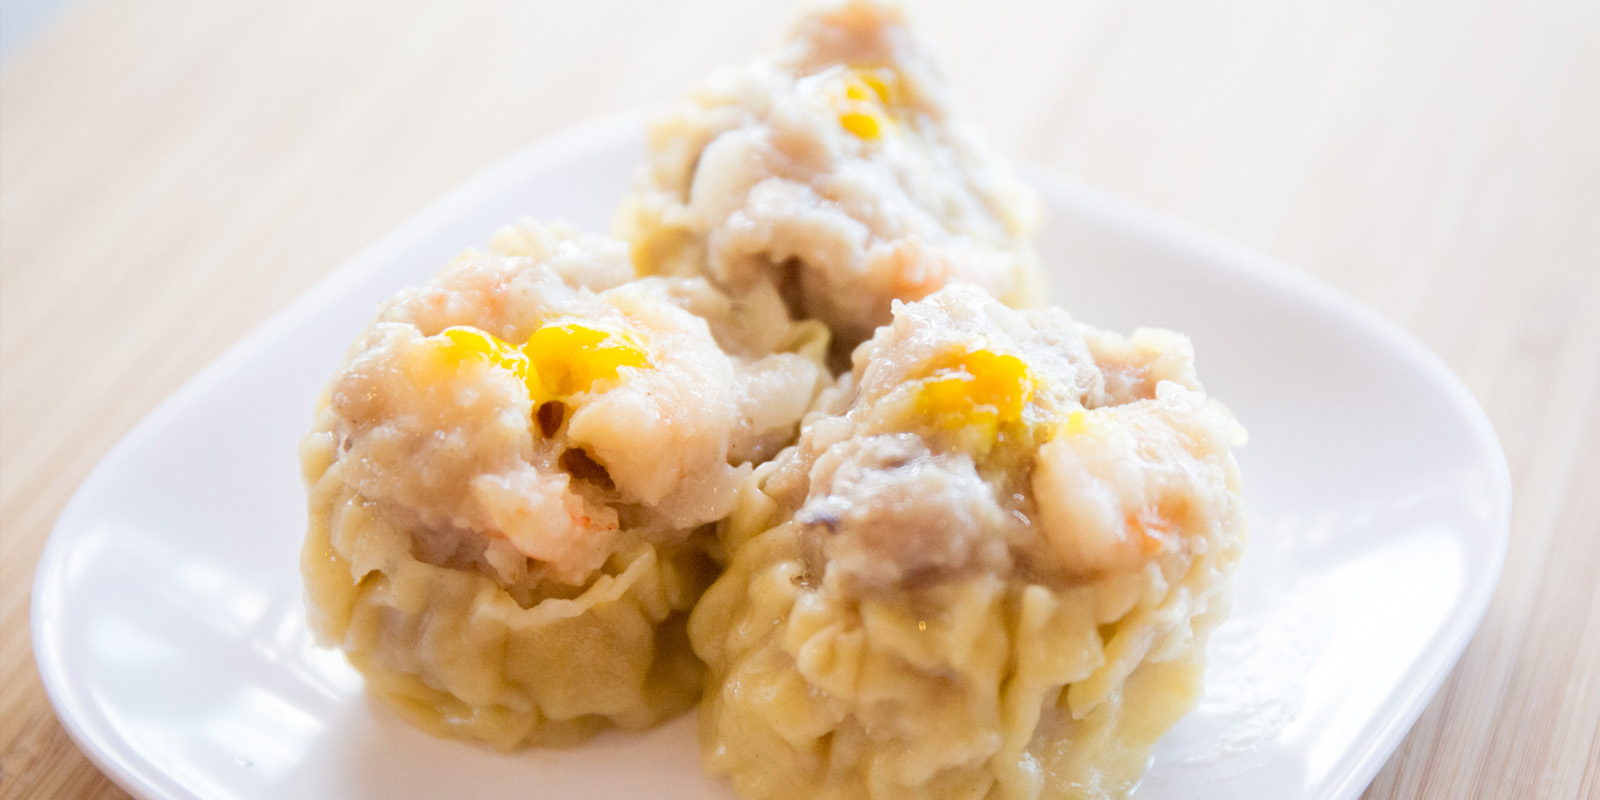 Top Sunnyvale Dim Sum Restaurants: Dim Sum King